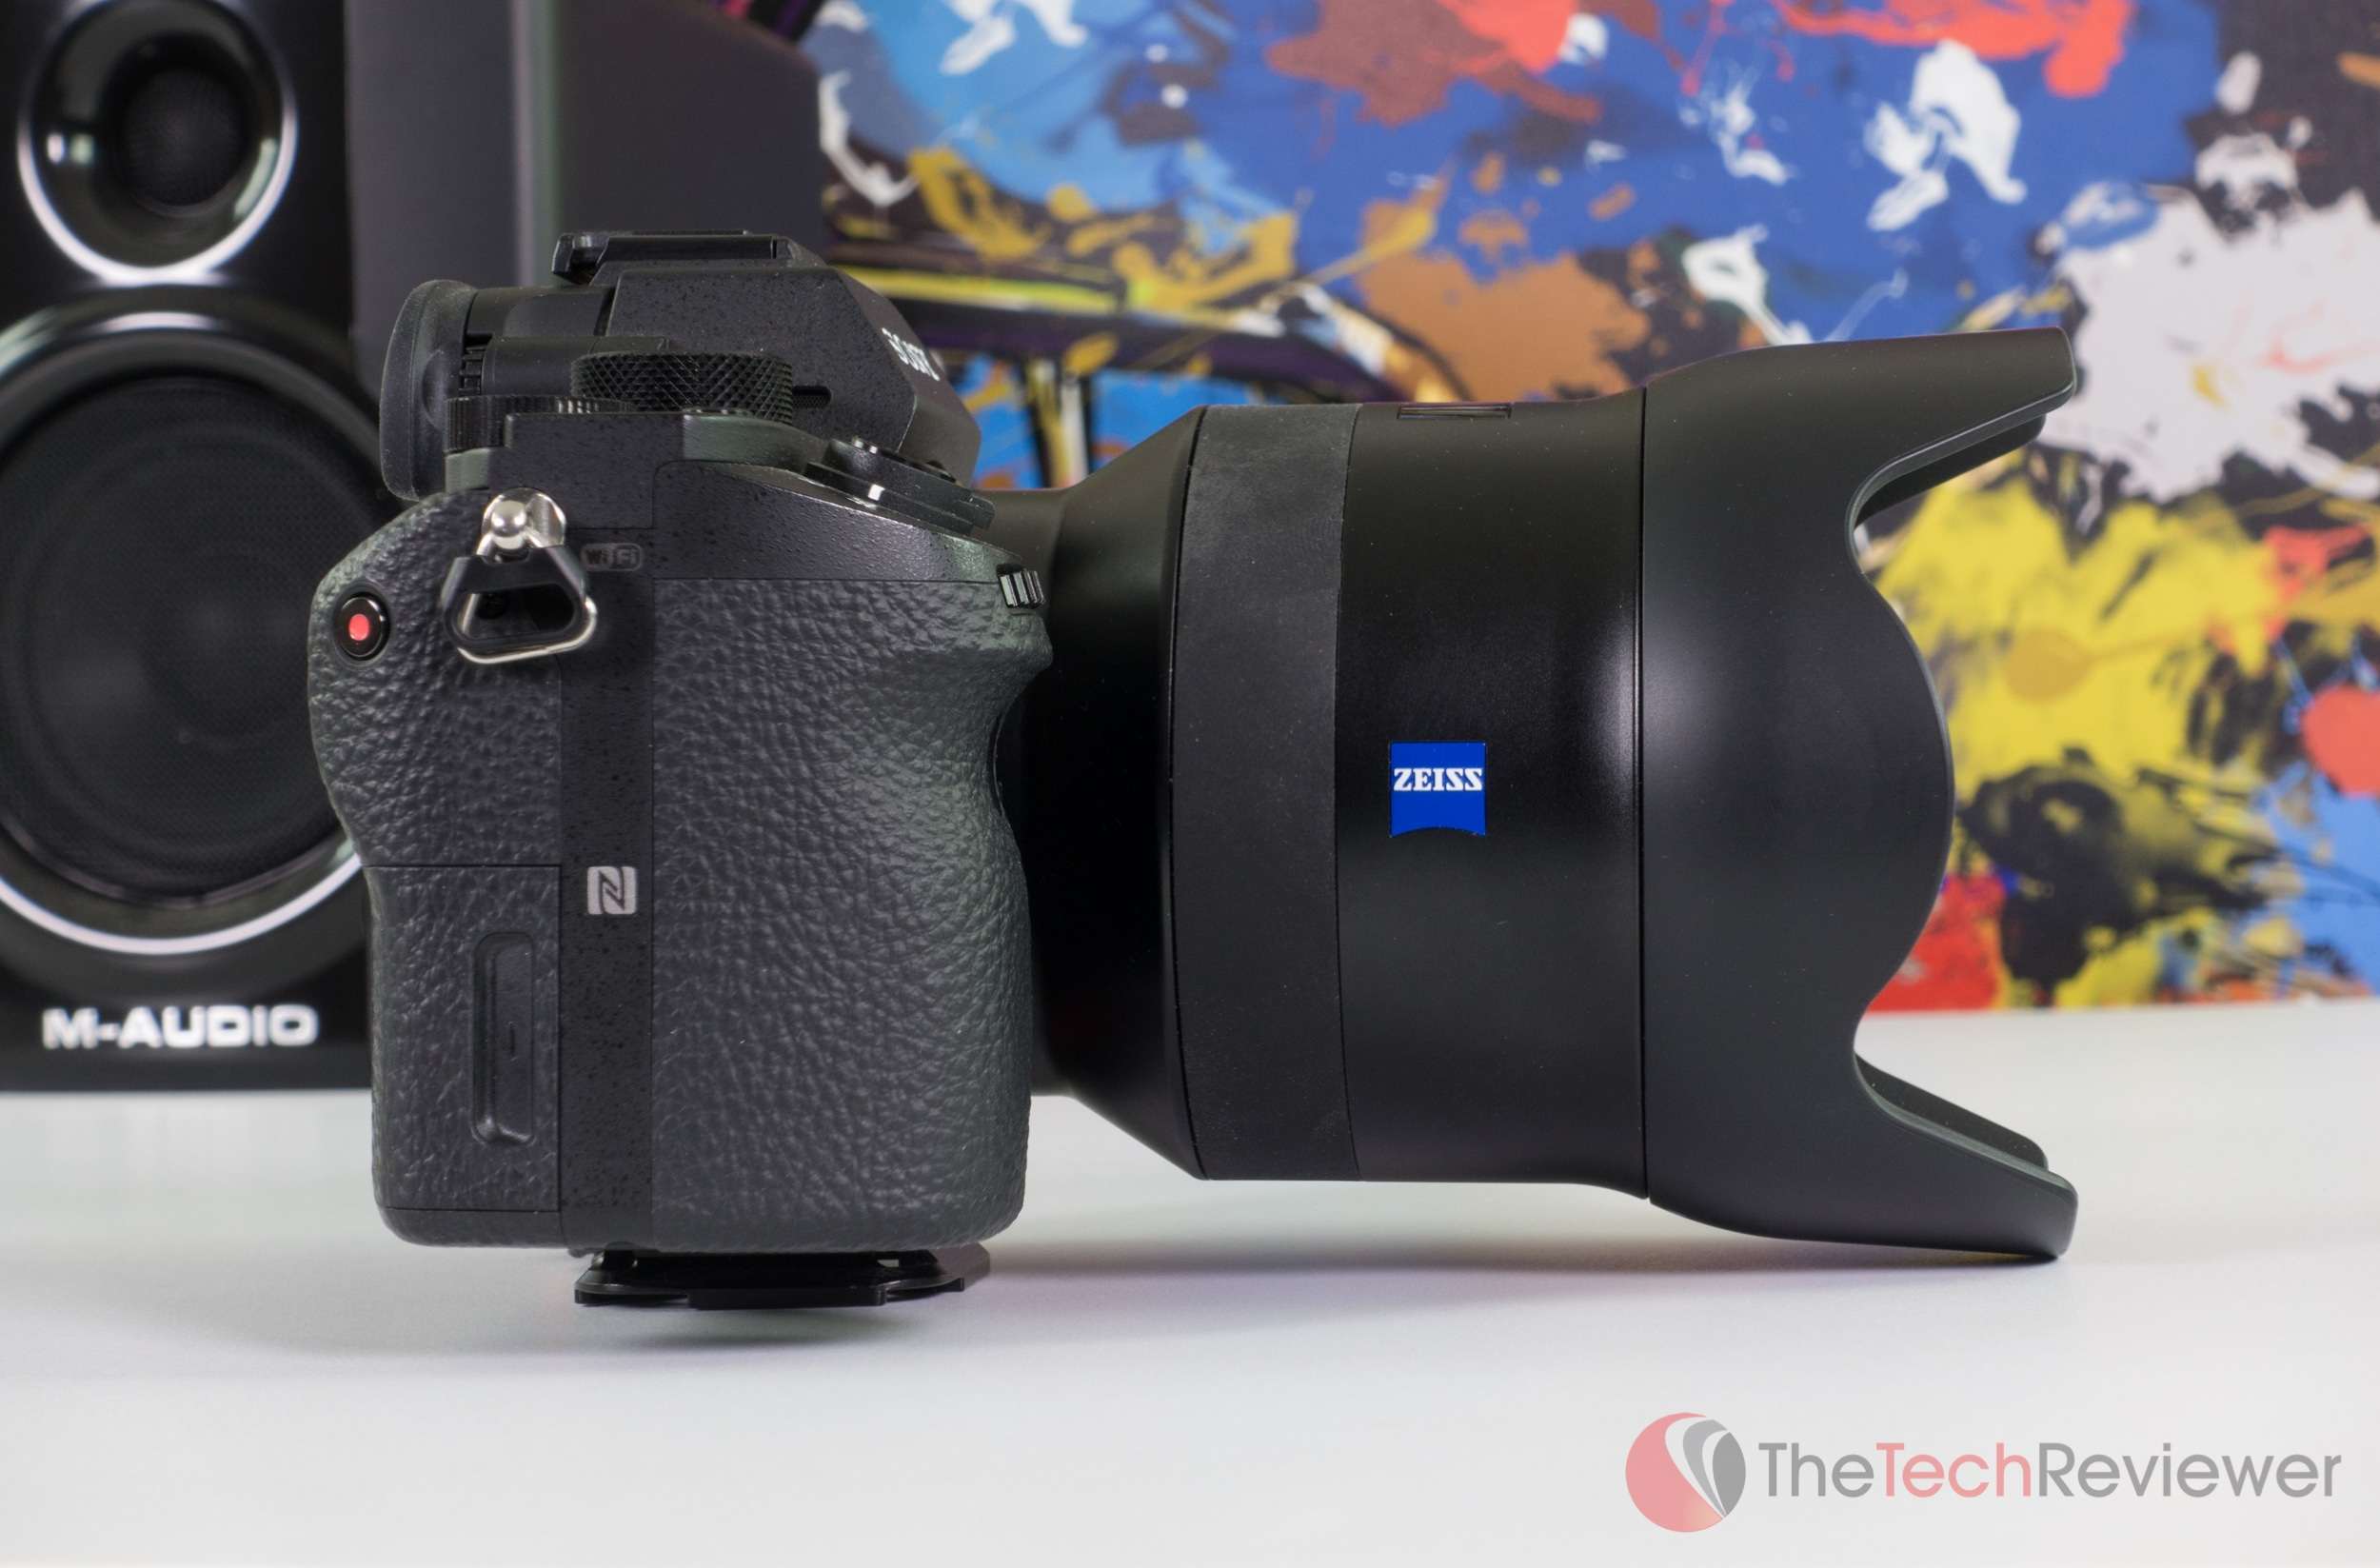 Lens%20on%20a7rii%20studio%20side-1